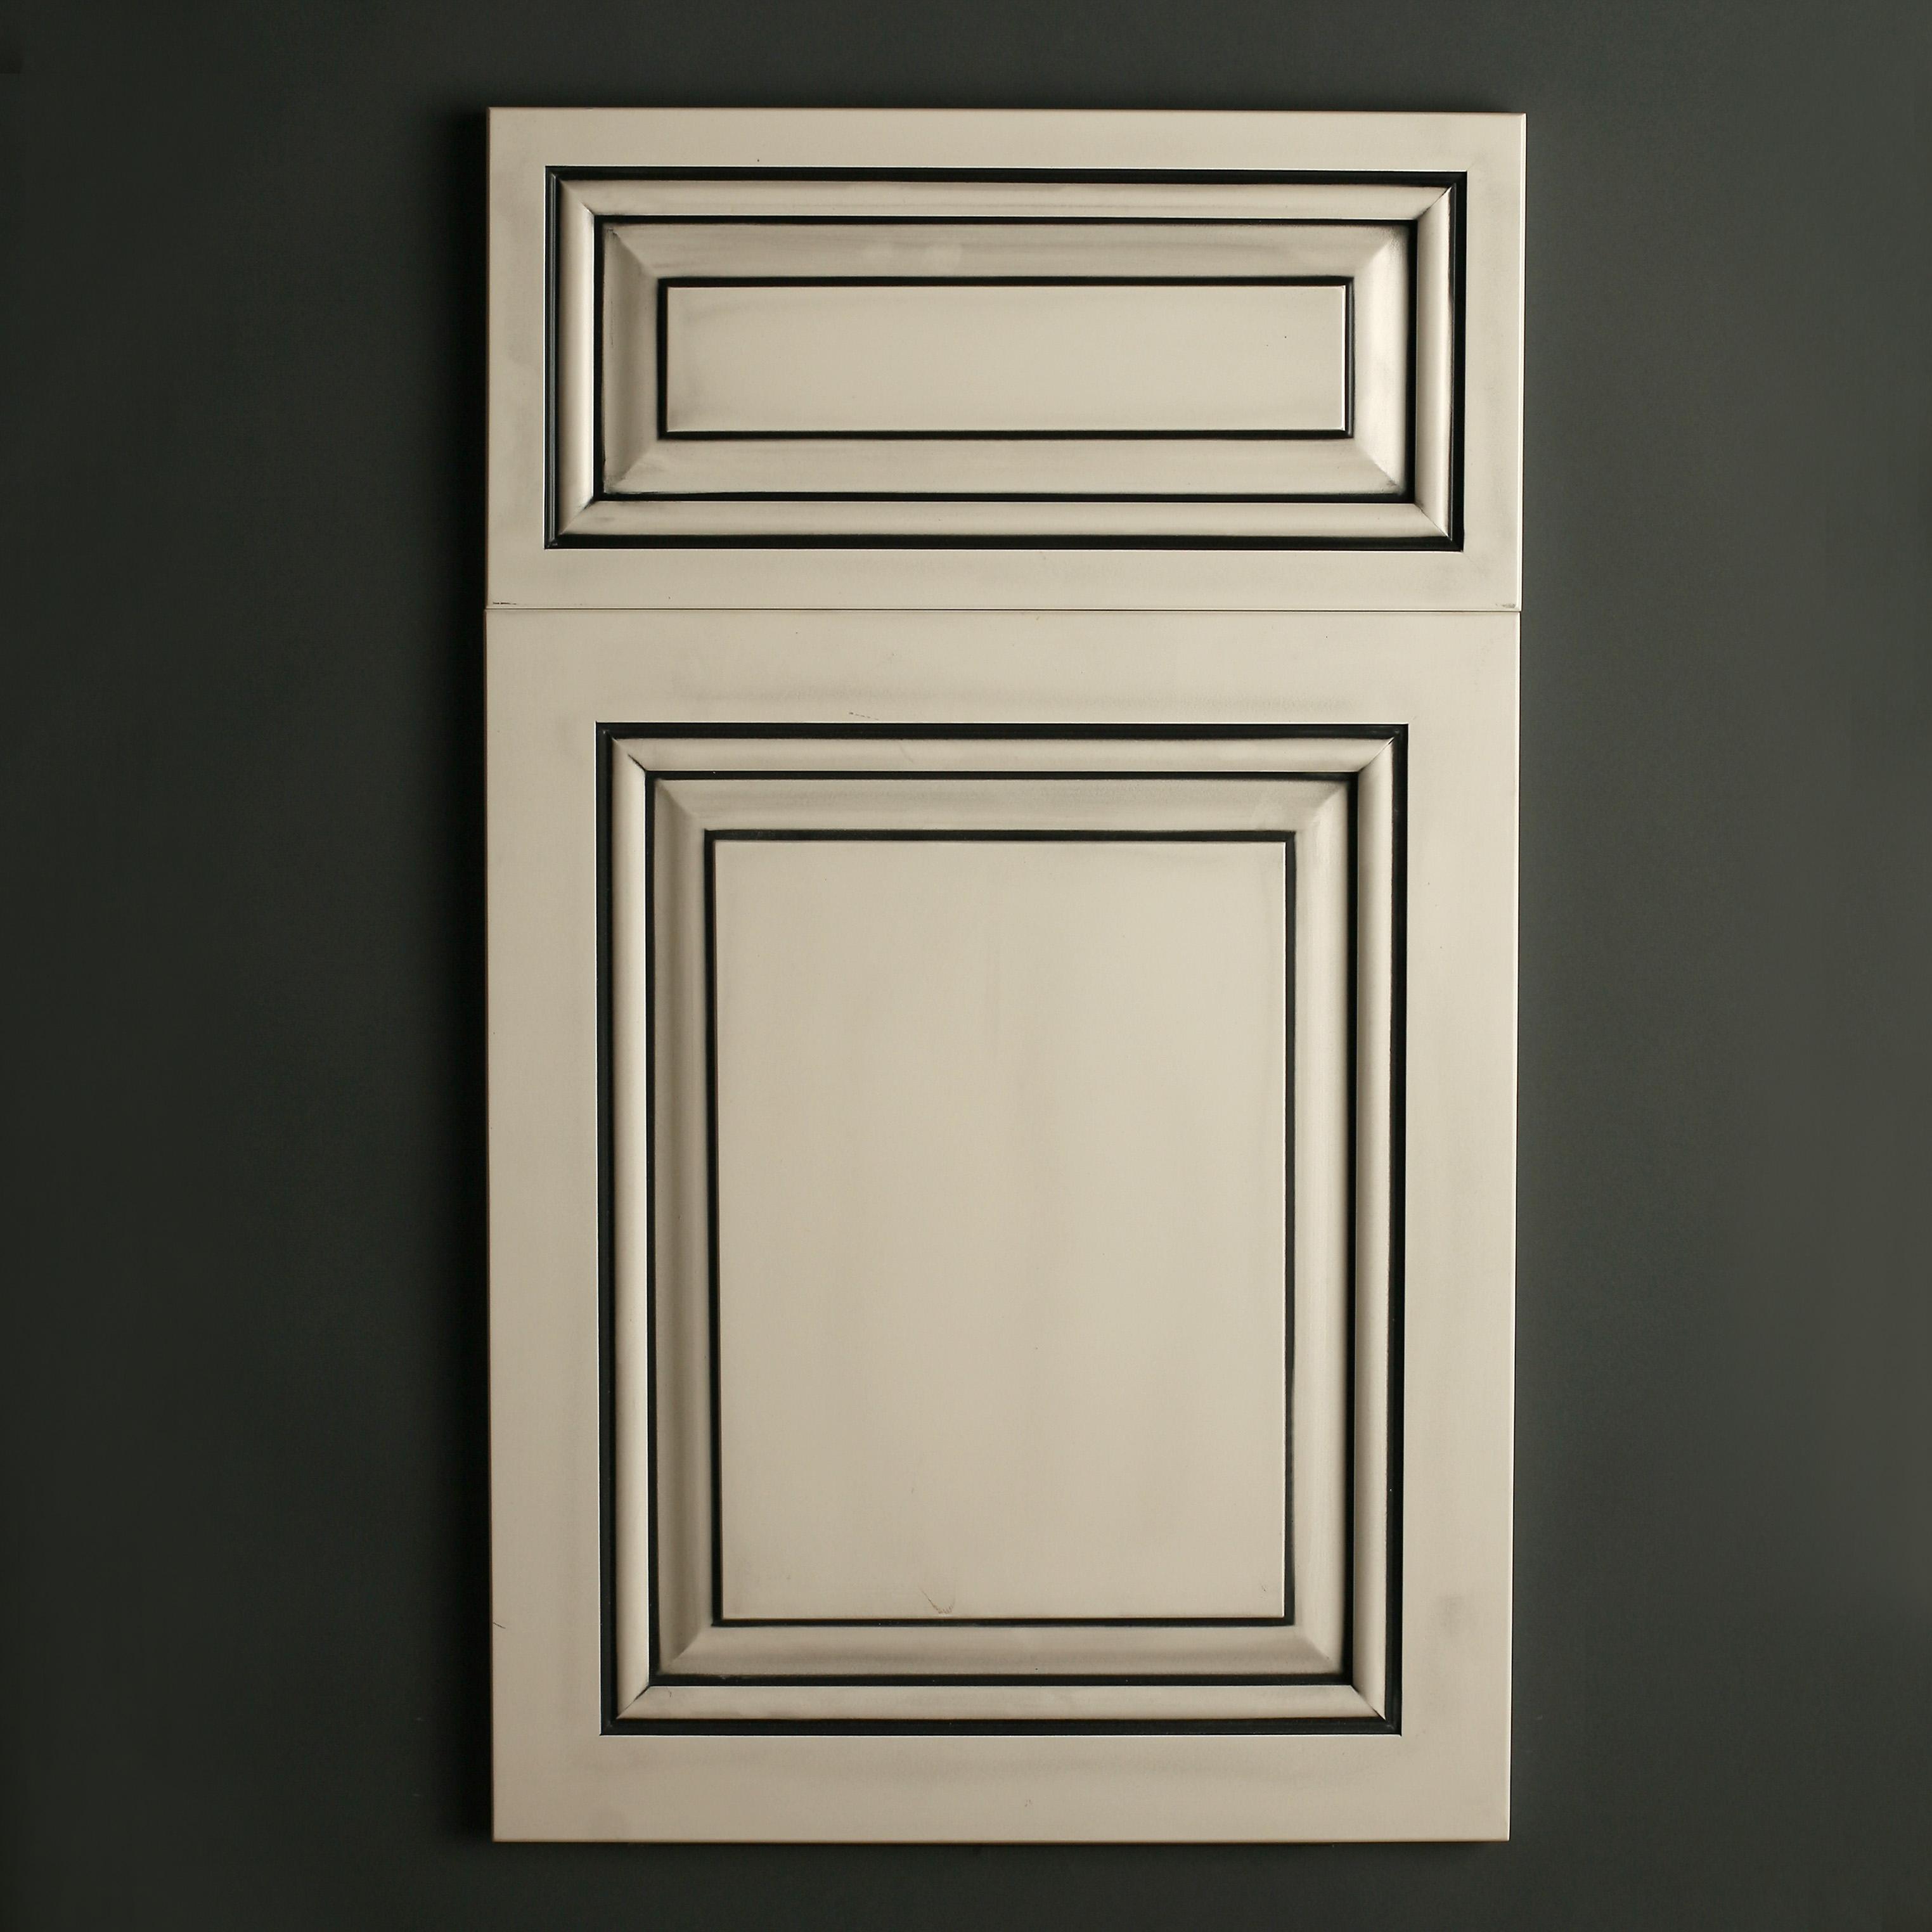 Satin White with Black Glaze